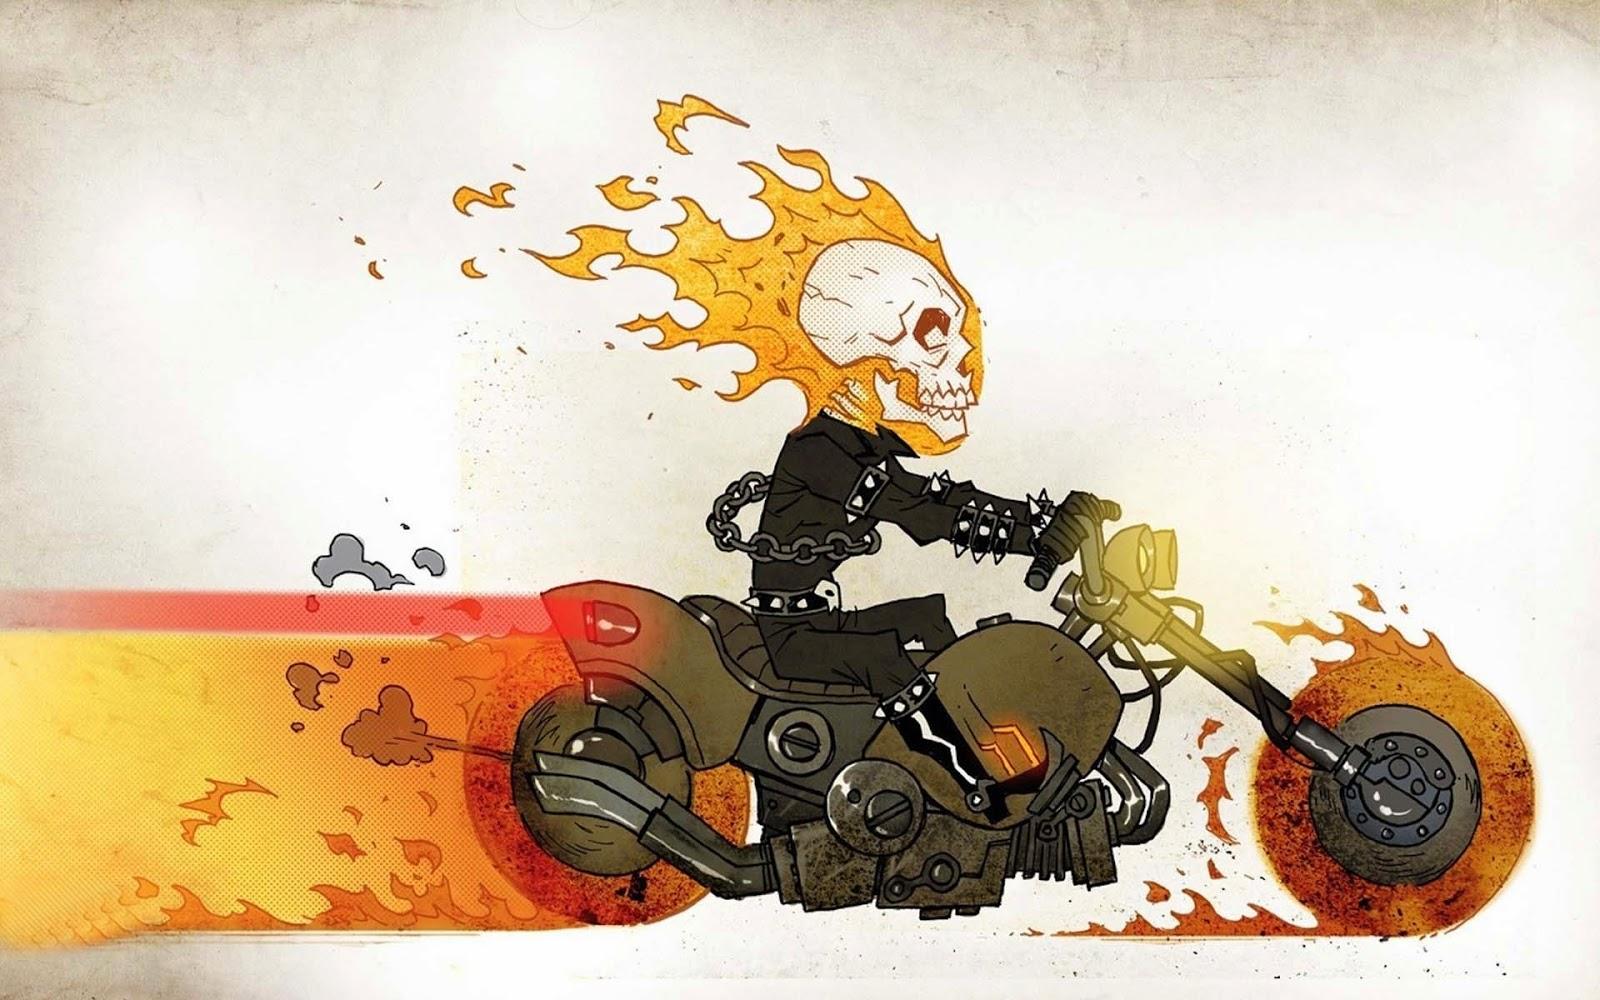 Ghost Rider Animated Cartoon Wallpaper